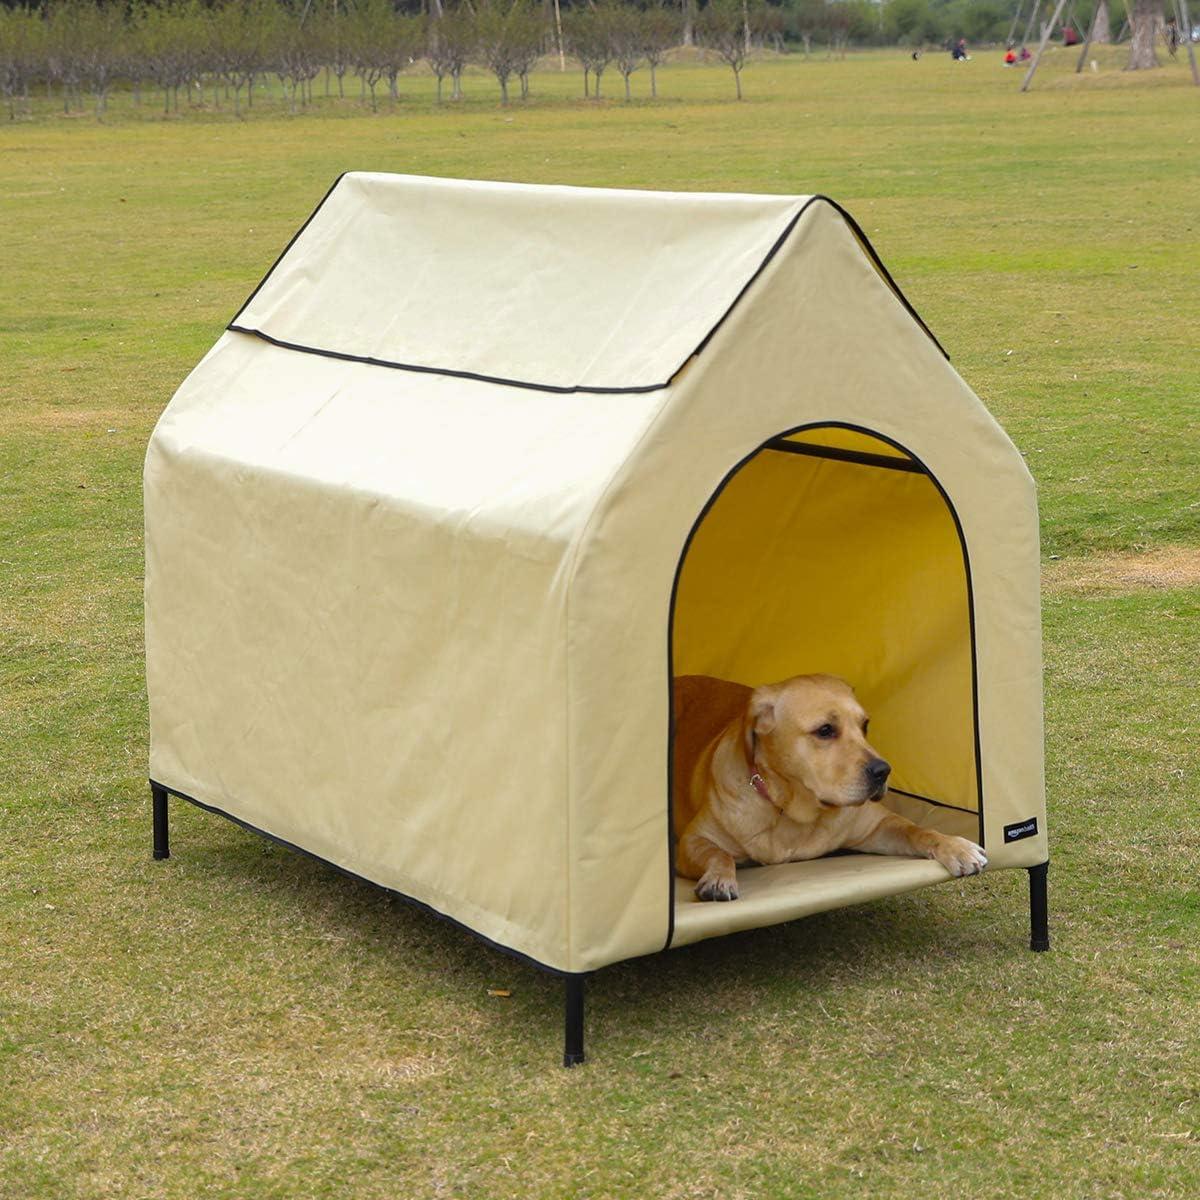 AmazonBasics - Caseta para mascotas, elevada, portátil, grande, caqui